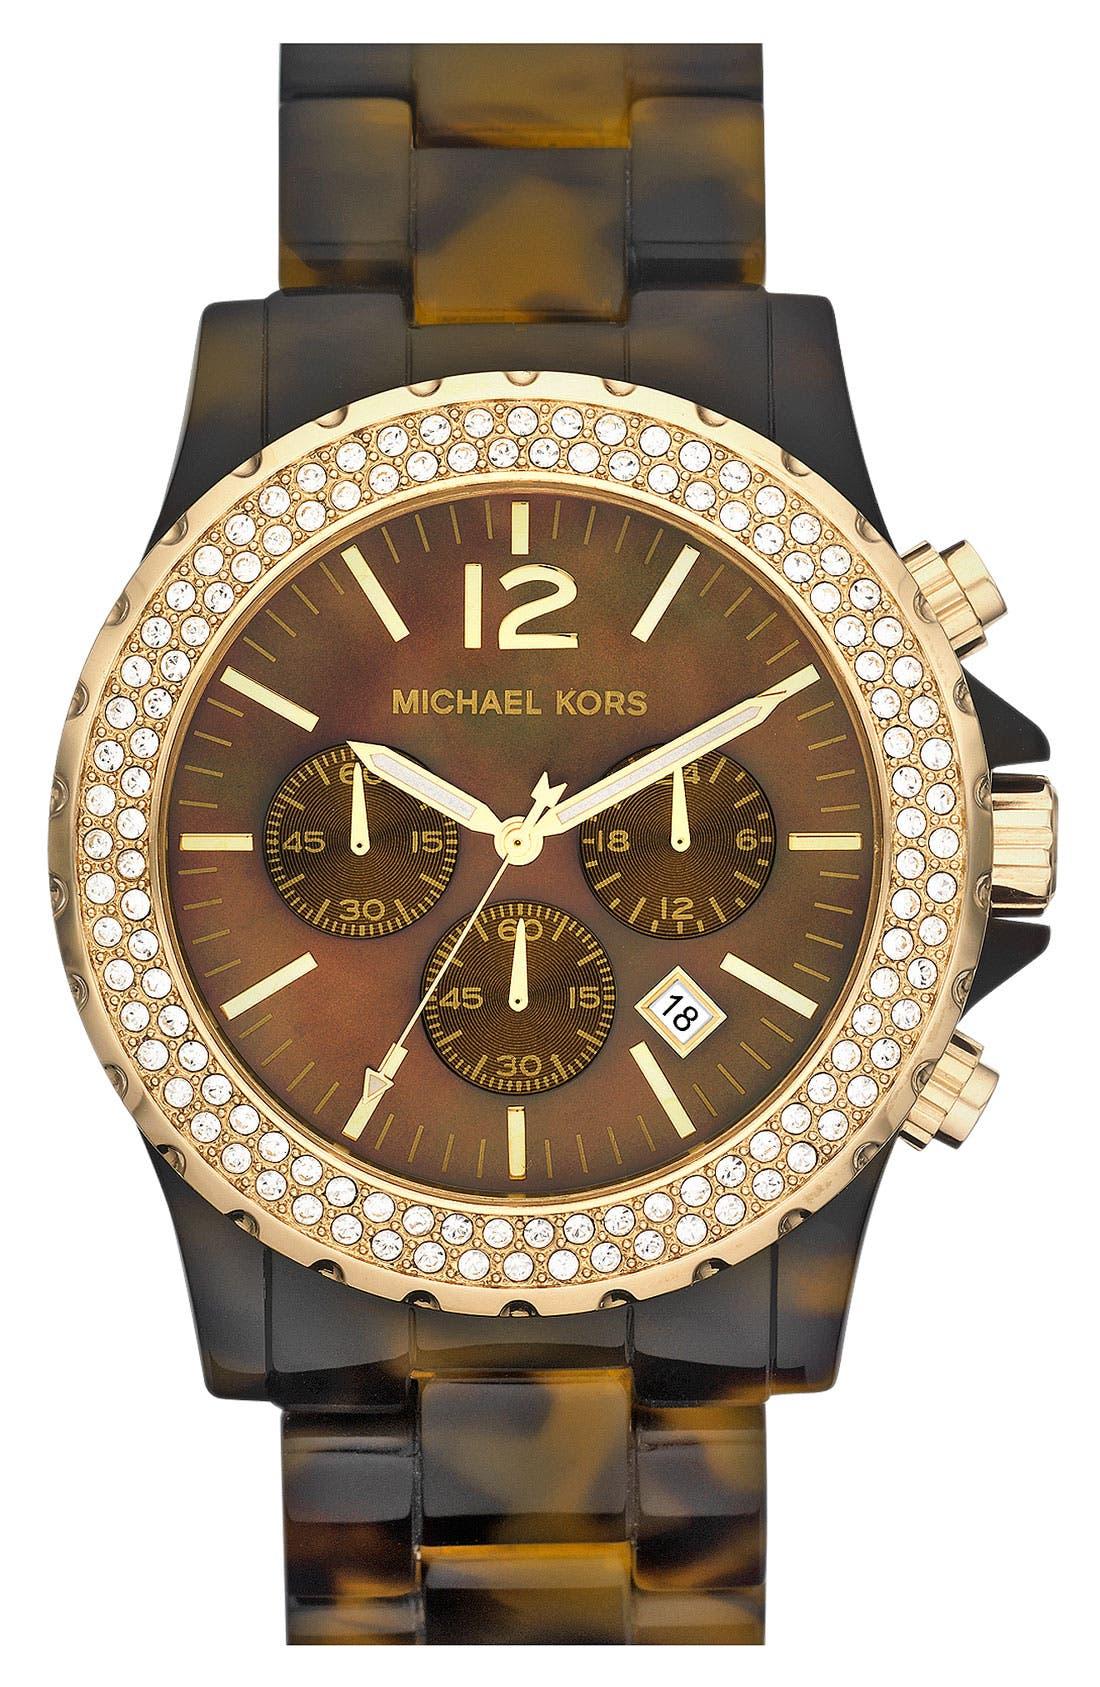 Main Image - Michael Kors 'Madison' Crystal Bezel Watch